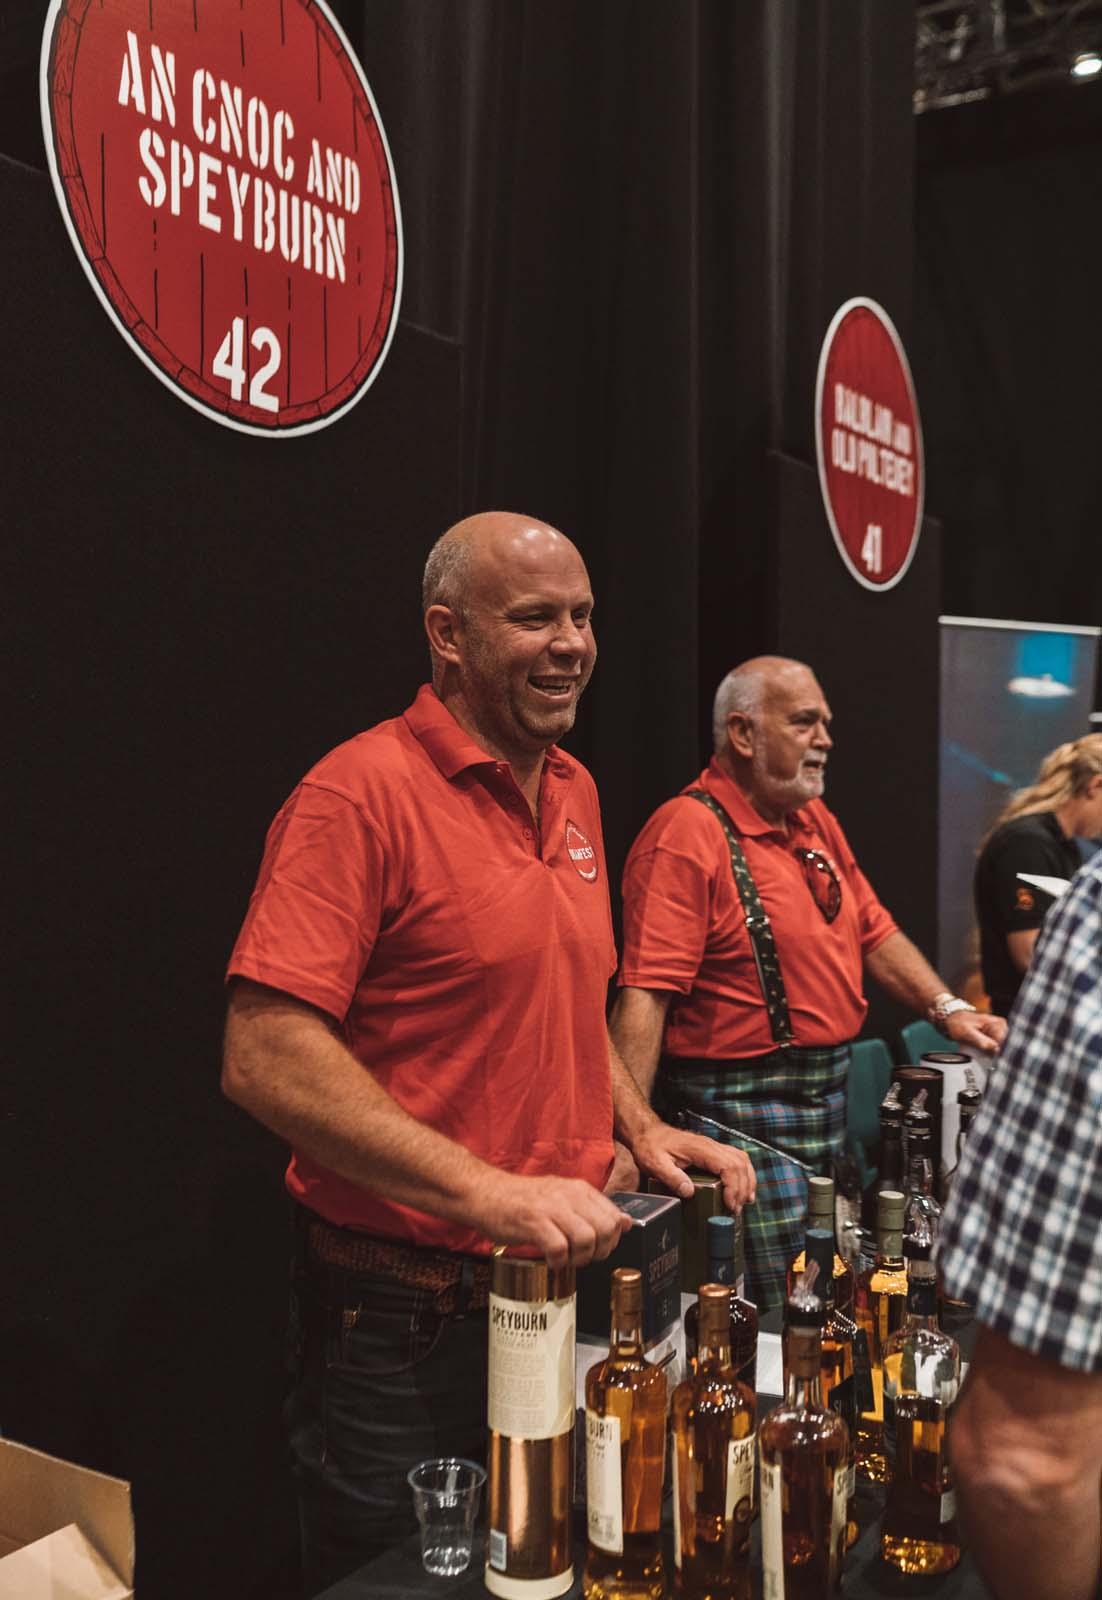 Dramfest 2018 for Whisky Galore-393.jpg